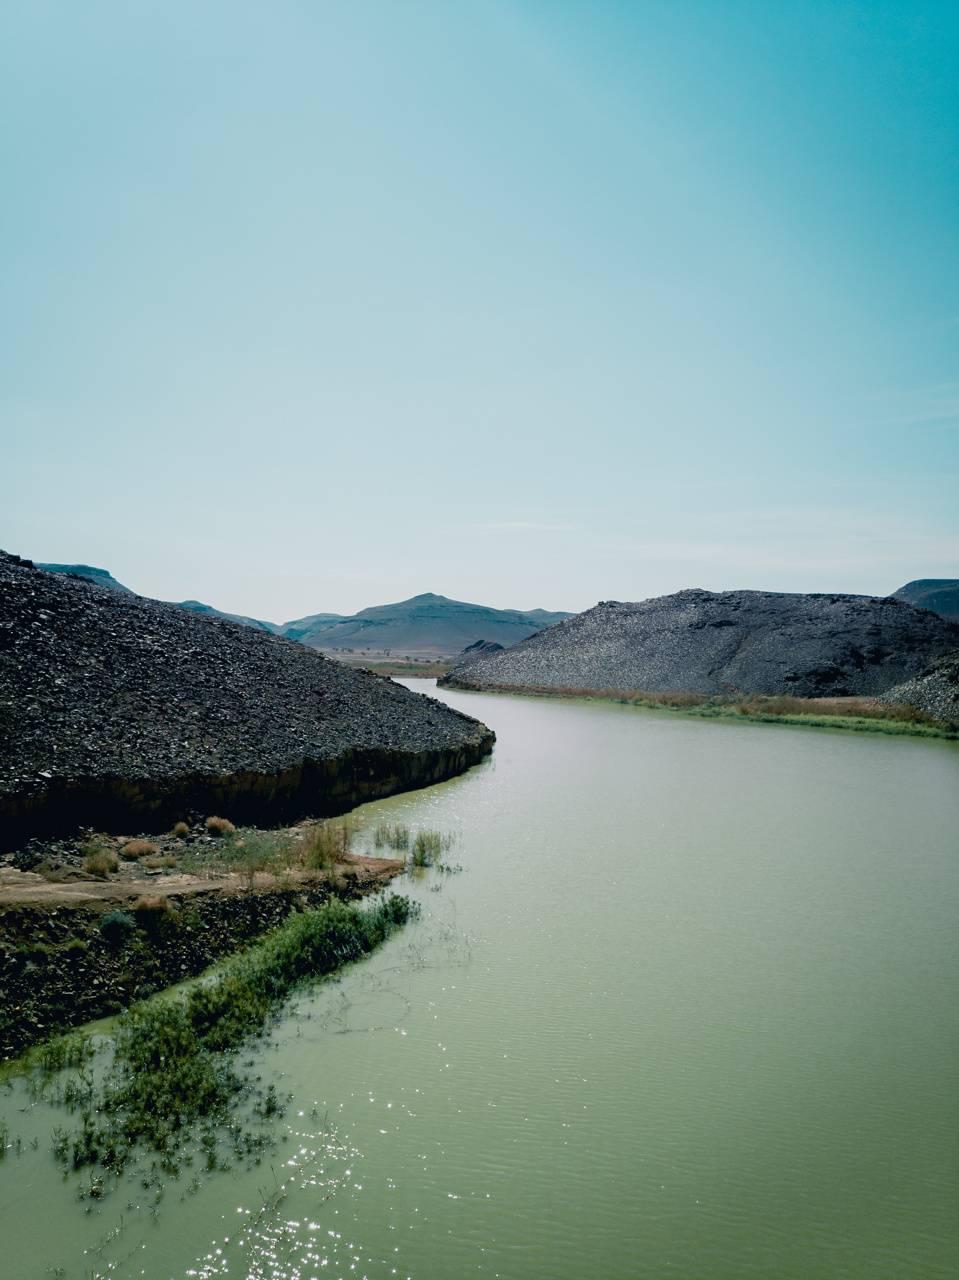 Wadi Alweshka